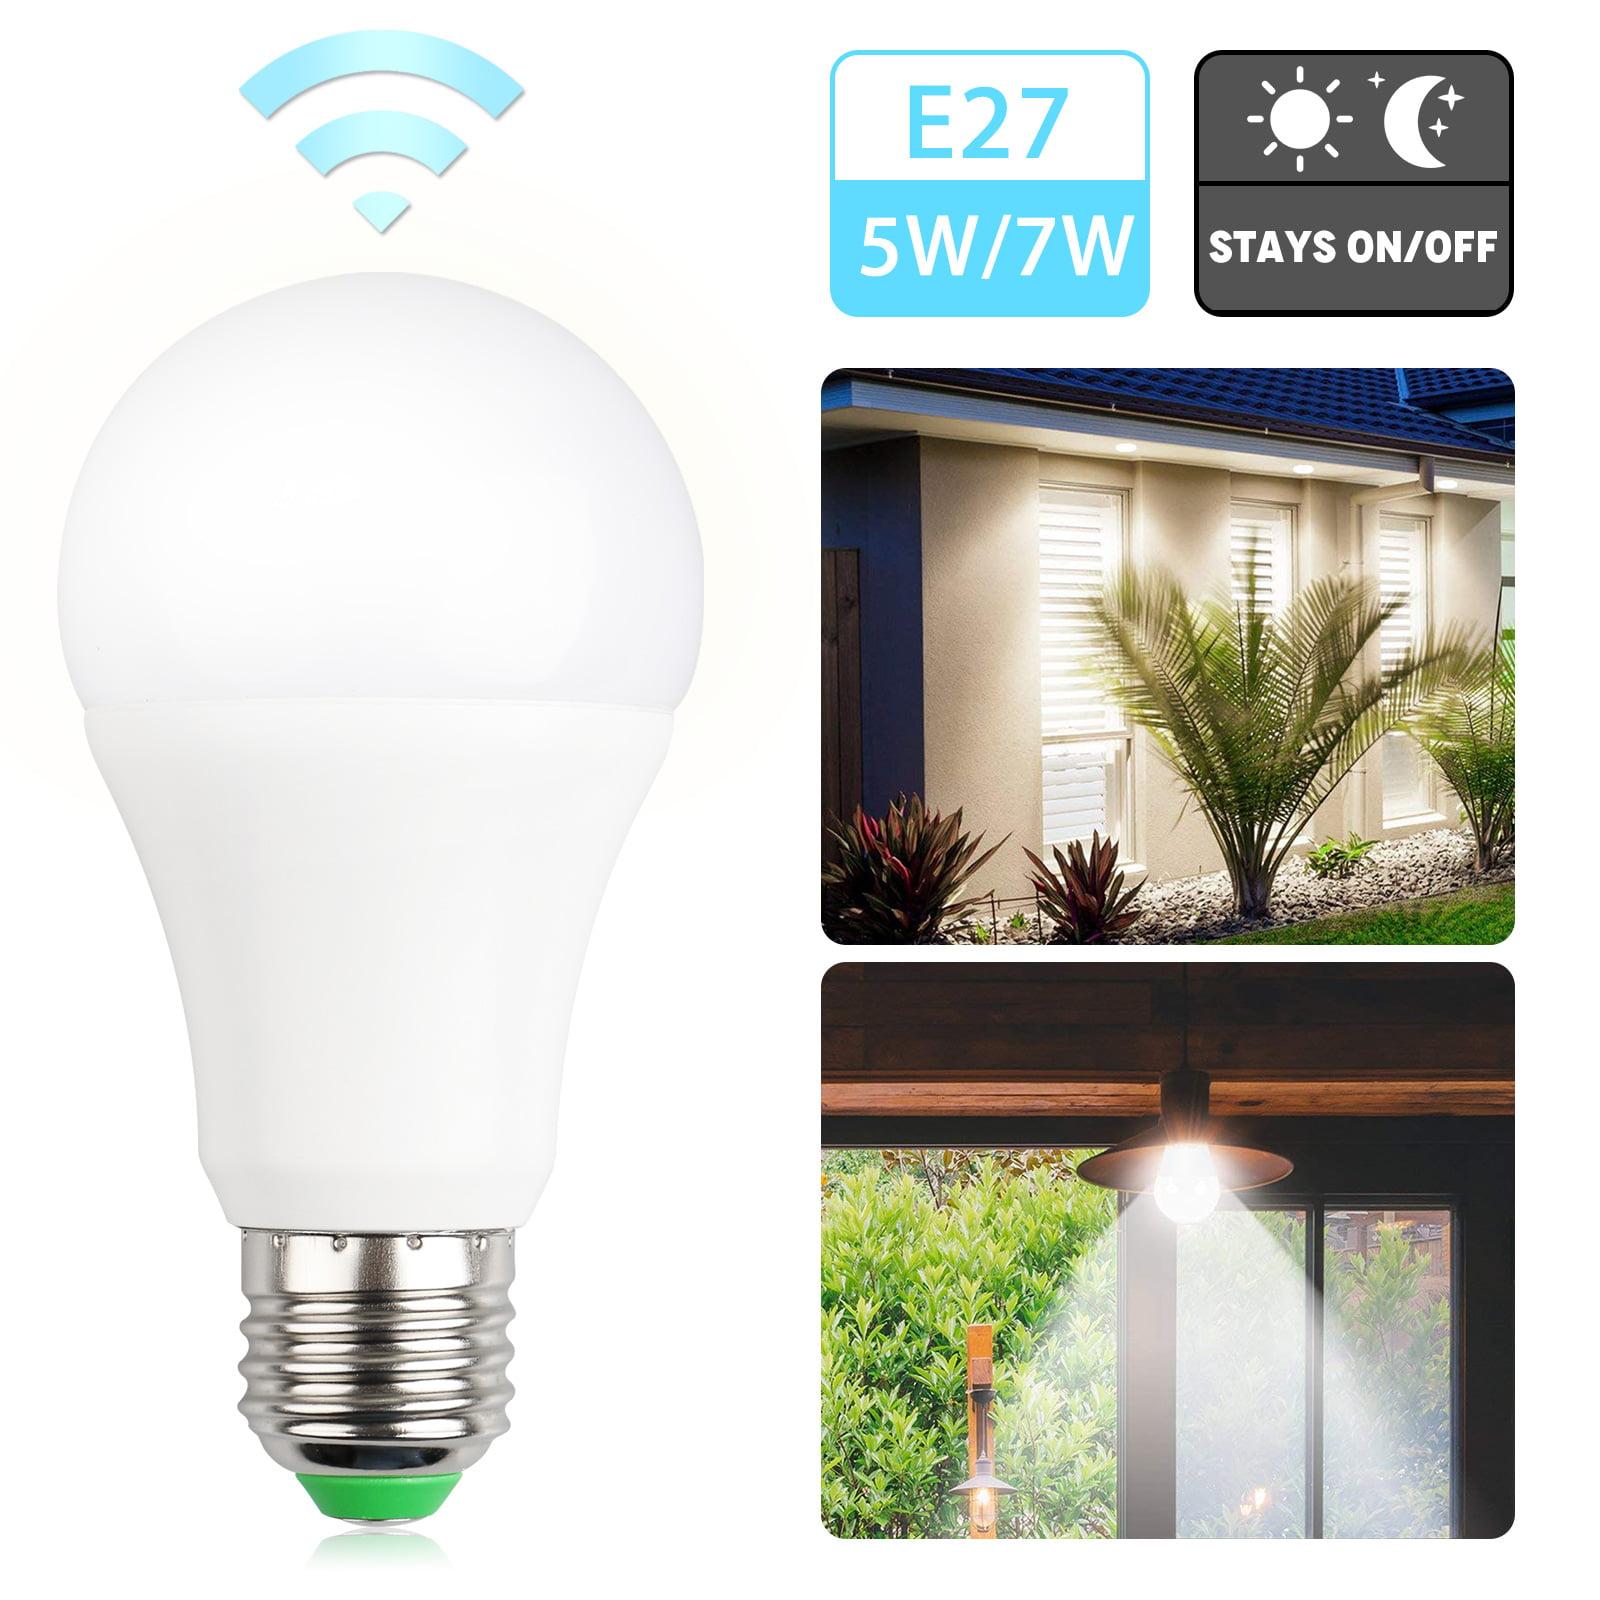 TSV LED Dusk-to-Dawn Light Bulb, E27 5W / 7W Medium Screw Base Soft White Sensor Light for Indoor and Outdoor Use